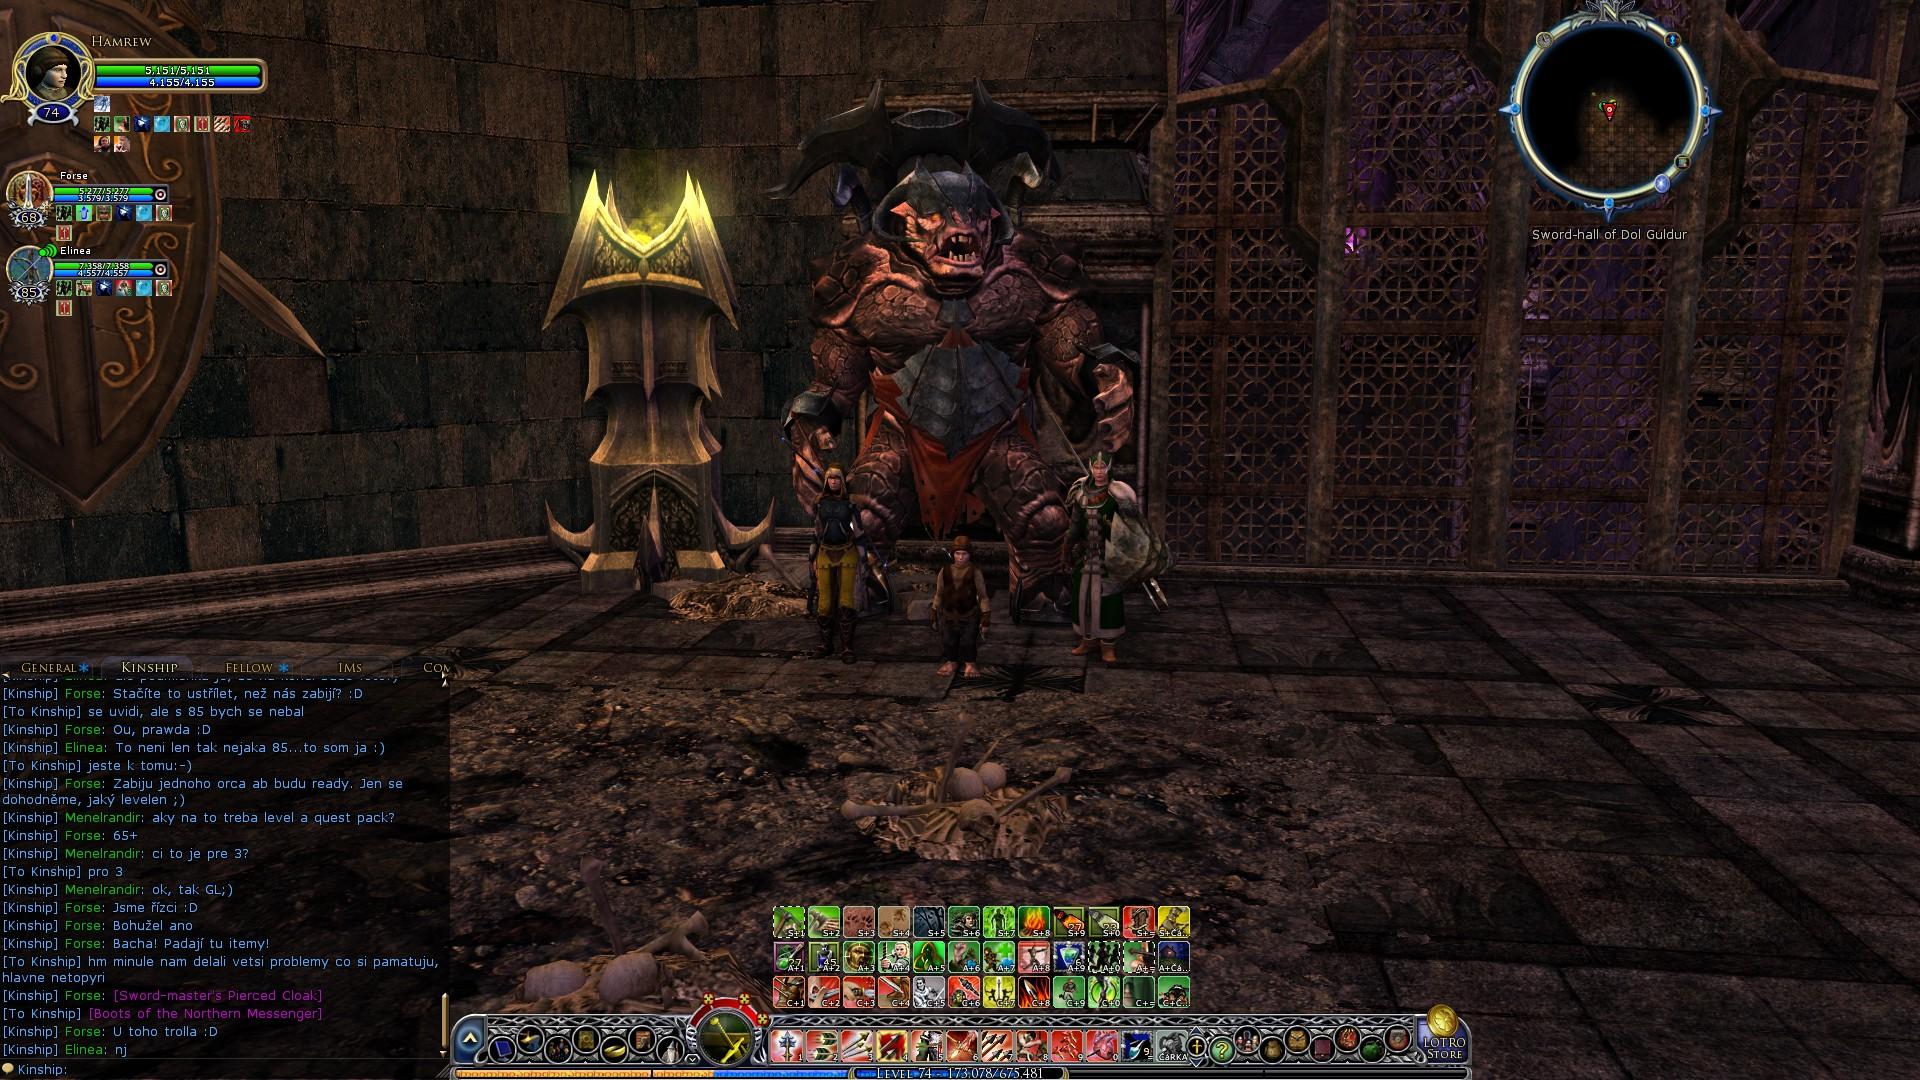 Sword-hall of Dol Guldur